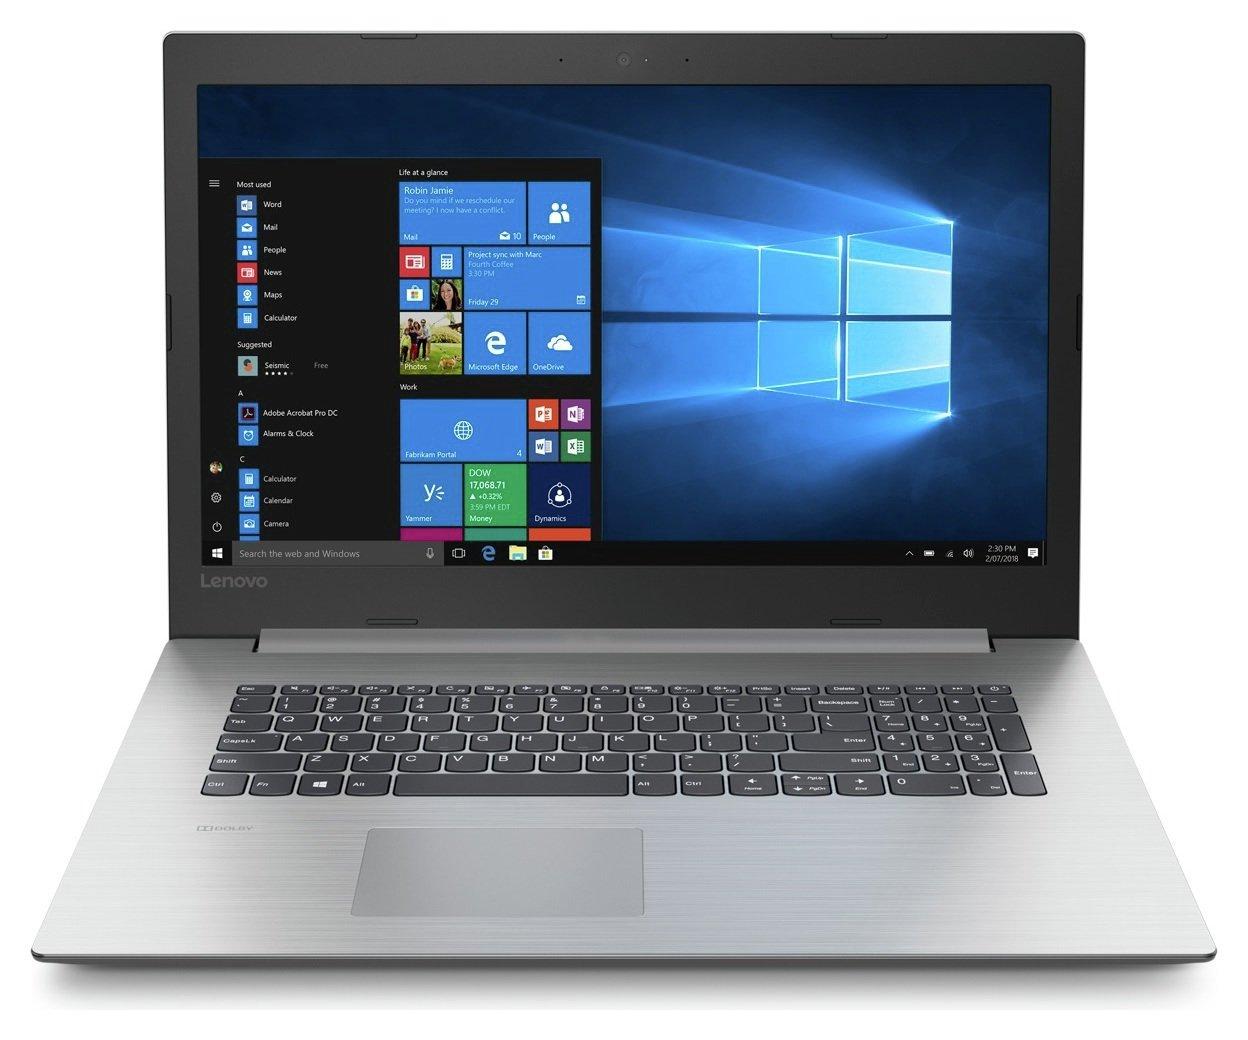 Lenovo IdeaPad 330 17.3 Inch i3 4GB 1TB Laptop - Grey